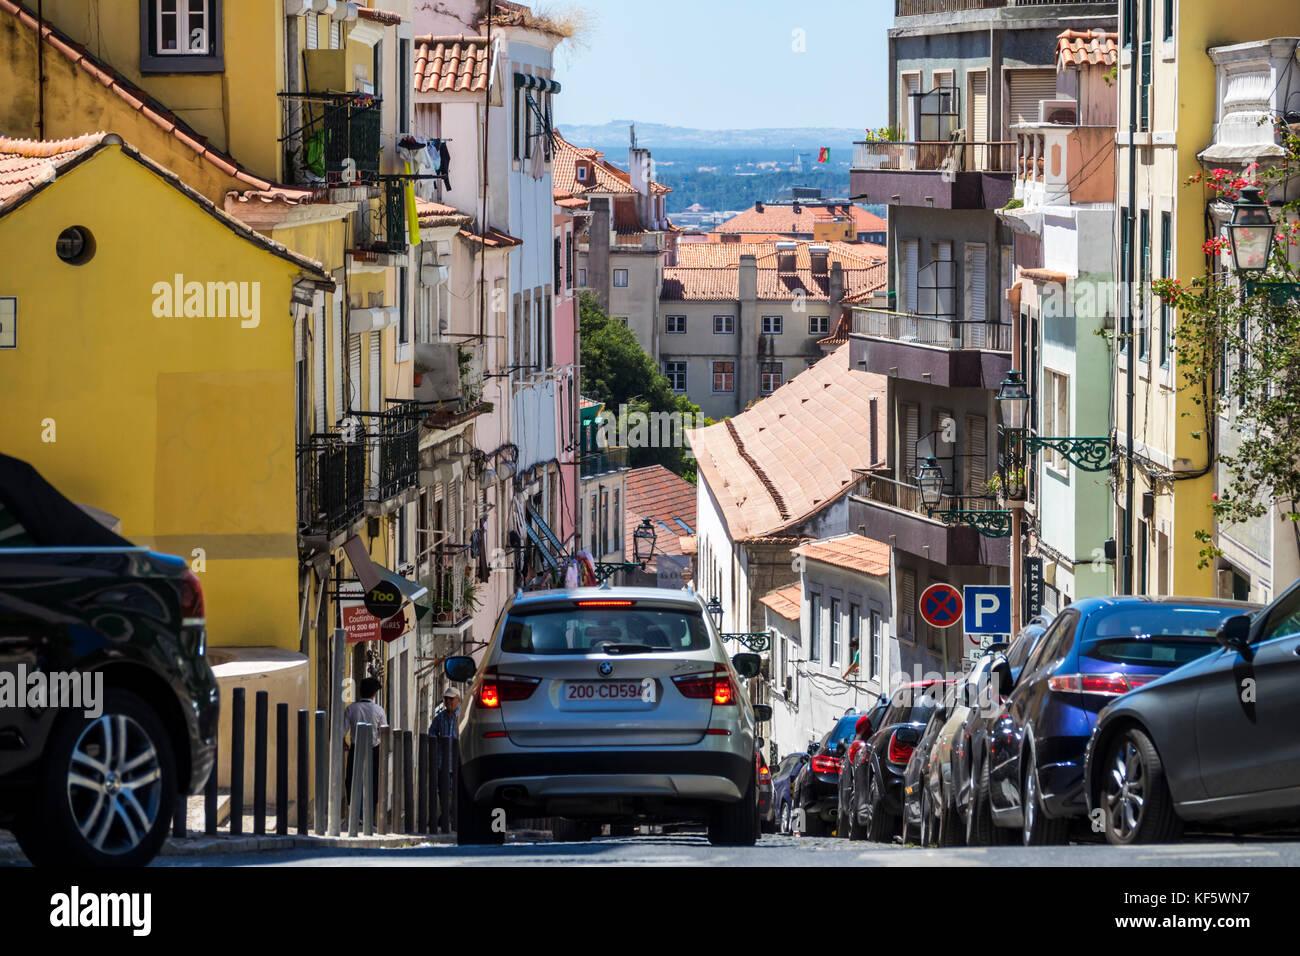 Lisbon Portugal Bairro Alto Principe Real descending street hill view buildings cars rooftops skyline city skyline - Stock Image